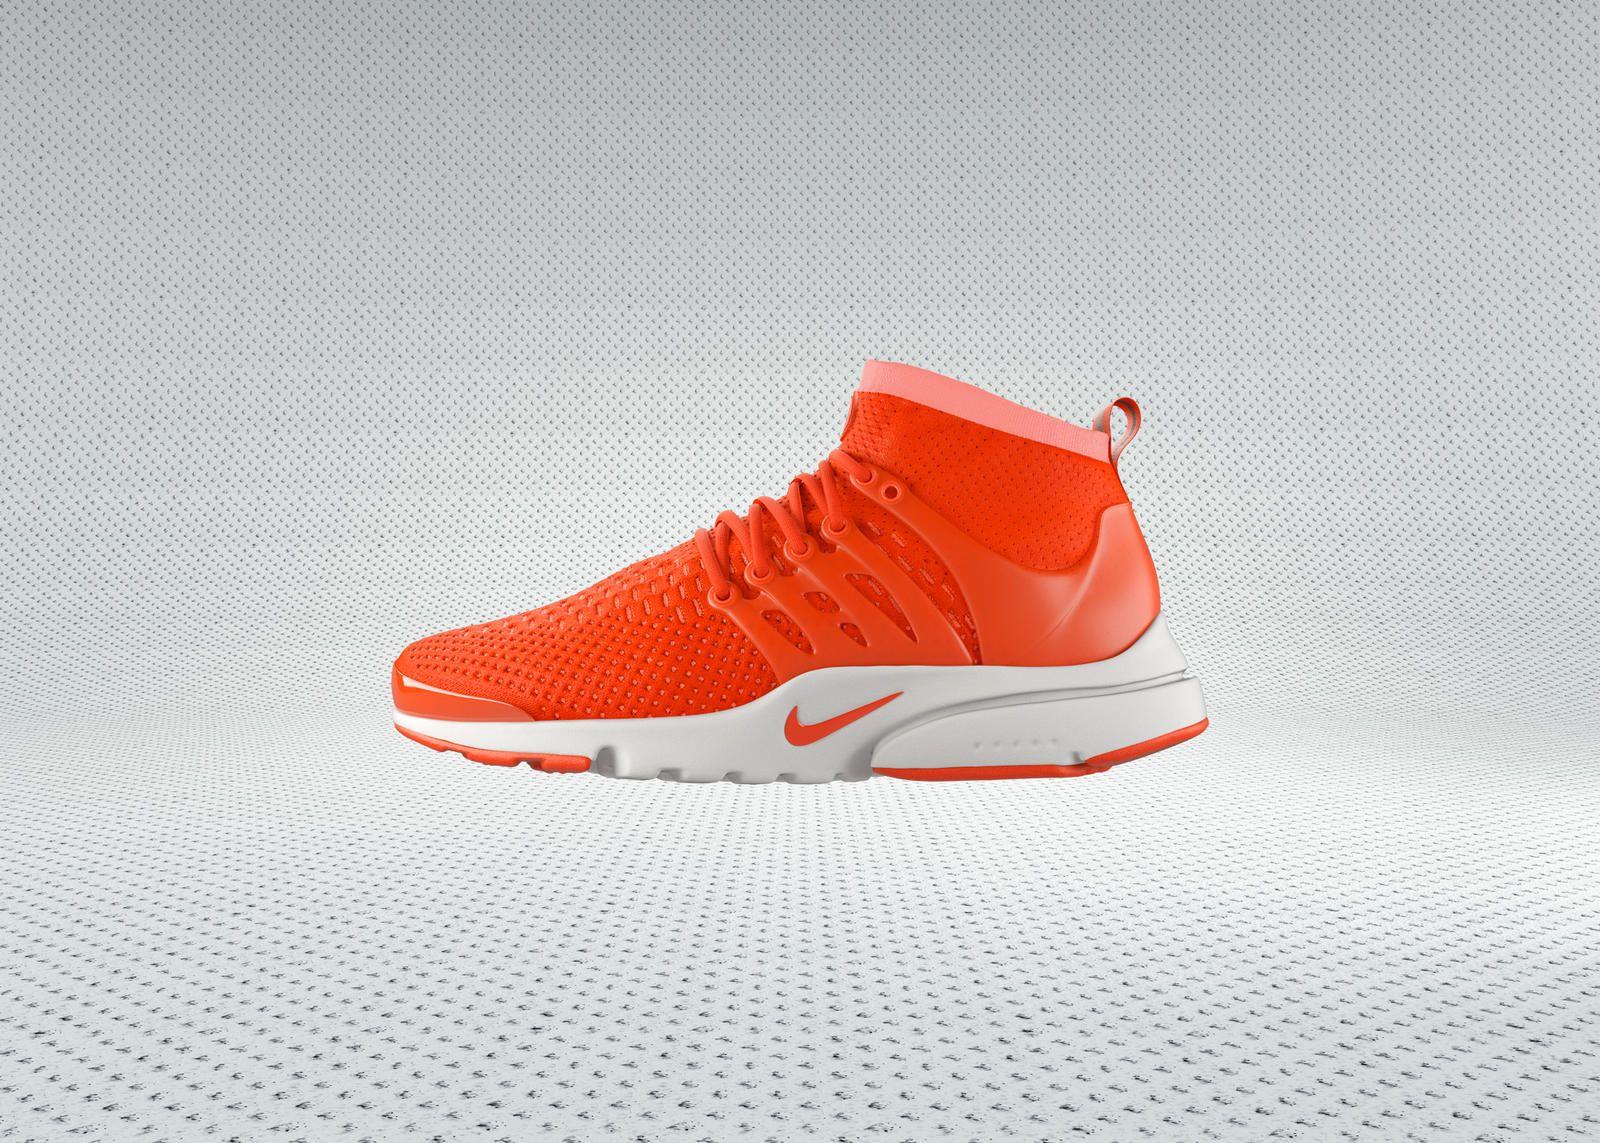 fbd00ec7b2 Nike Air Presto Gets Updated with Flyknit | Gear | Nike, Trainers ...